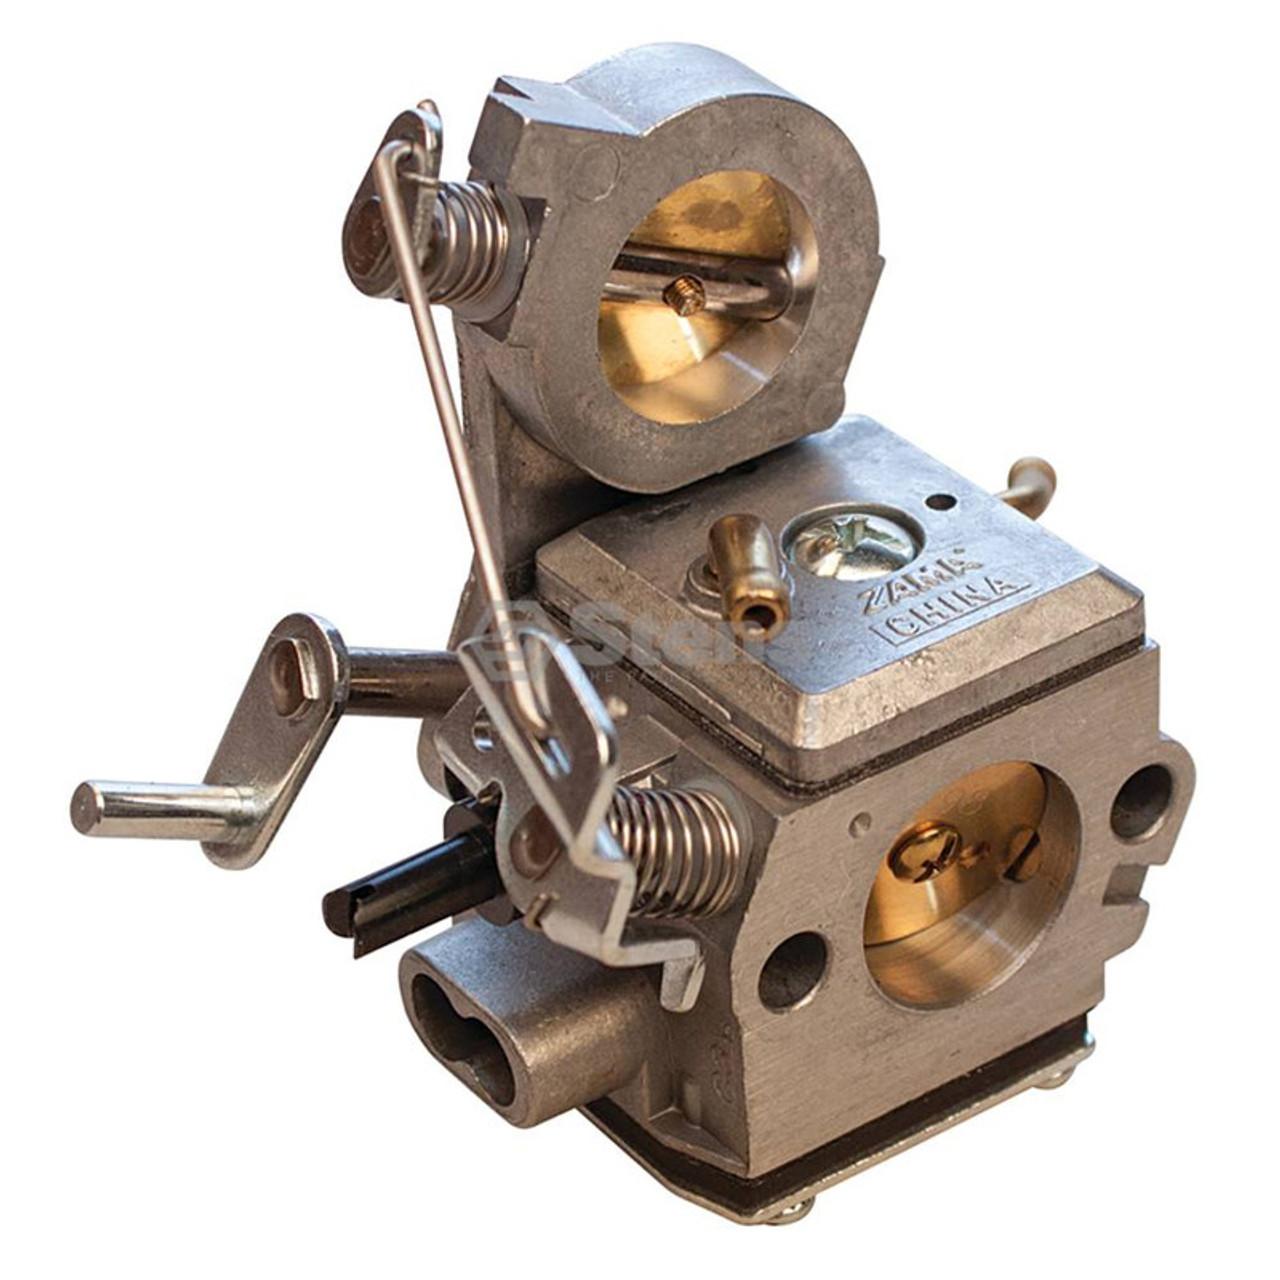 Carburetor for Husqvarna K750 Cut Off Saw 503283209 Zama